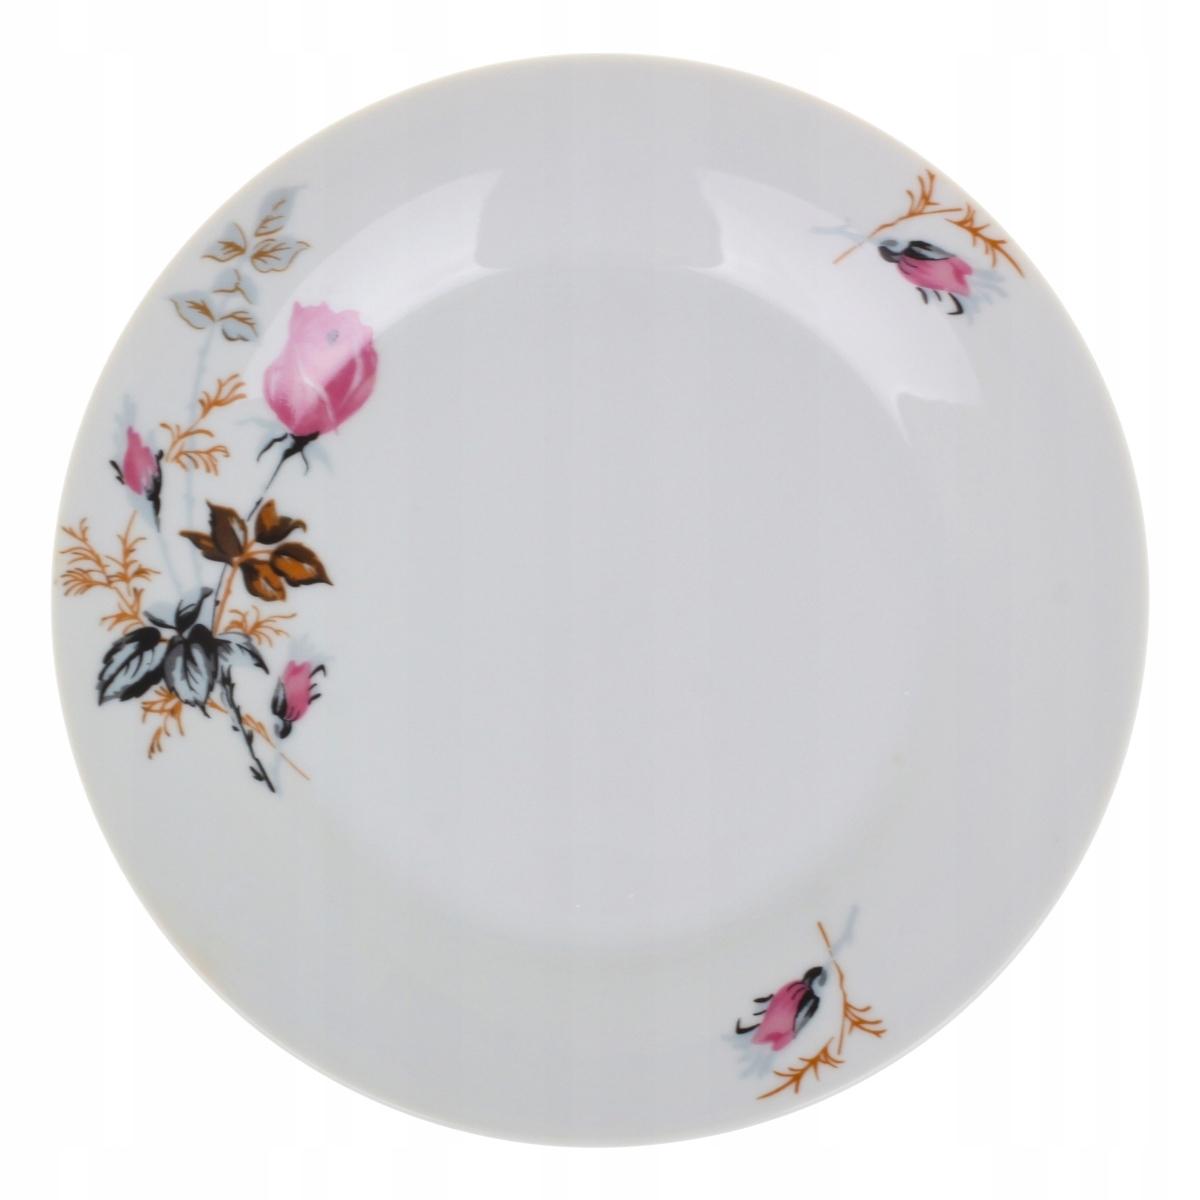 Тарелка обеденная 24 см, роза KOKO 3289